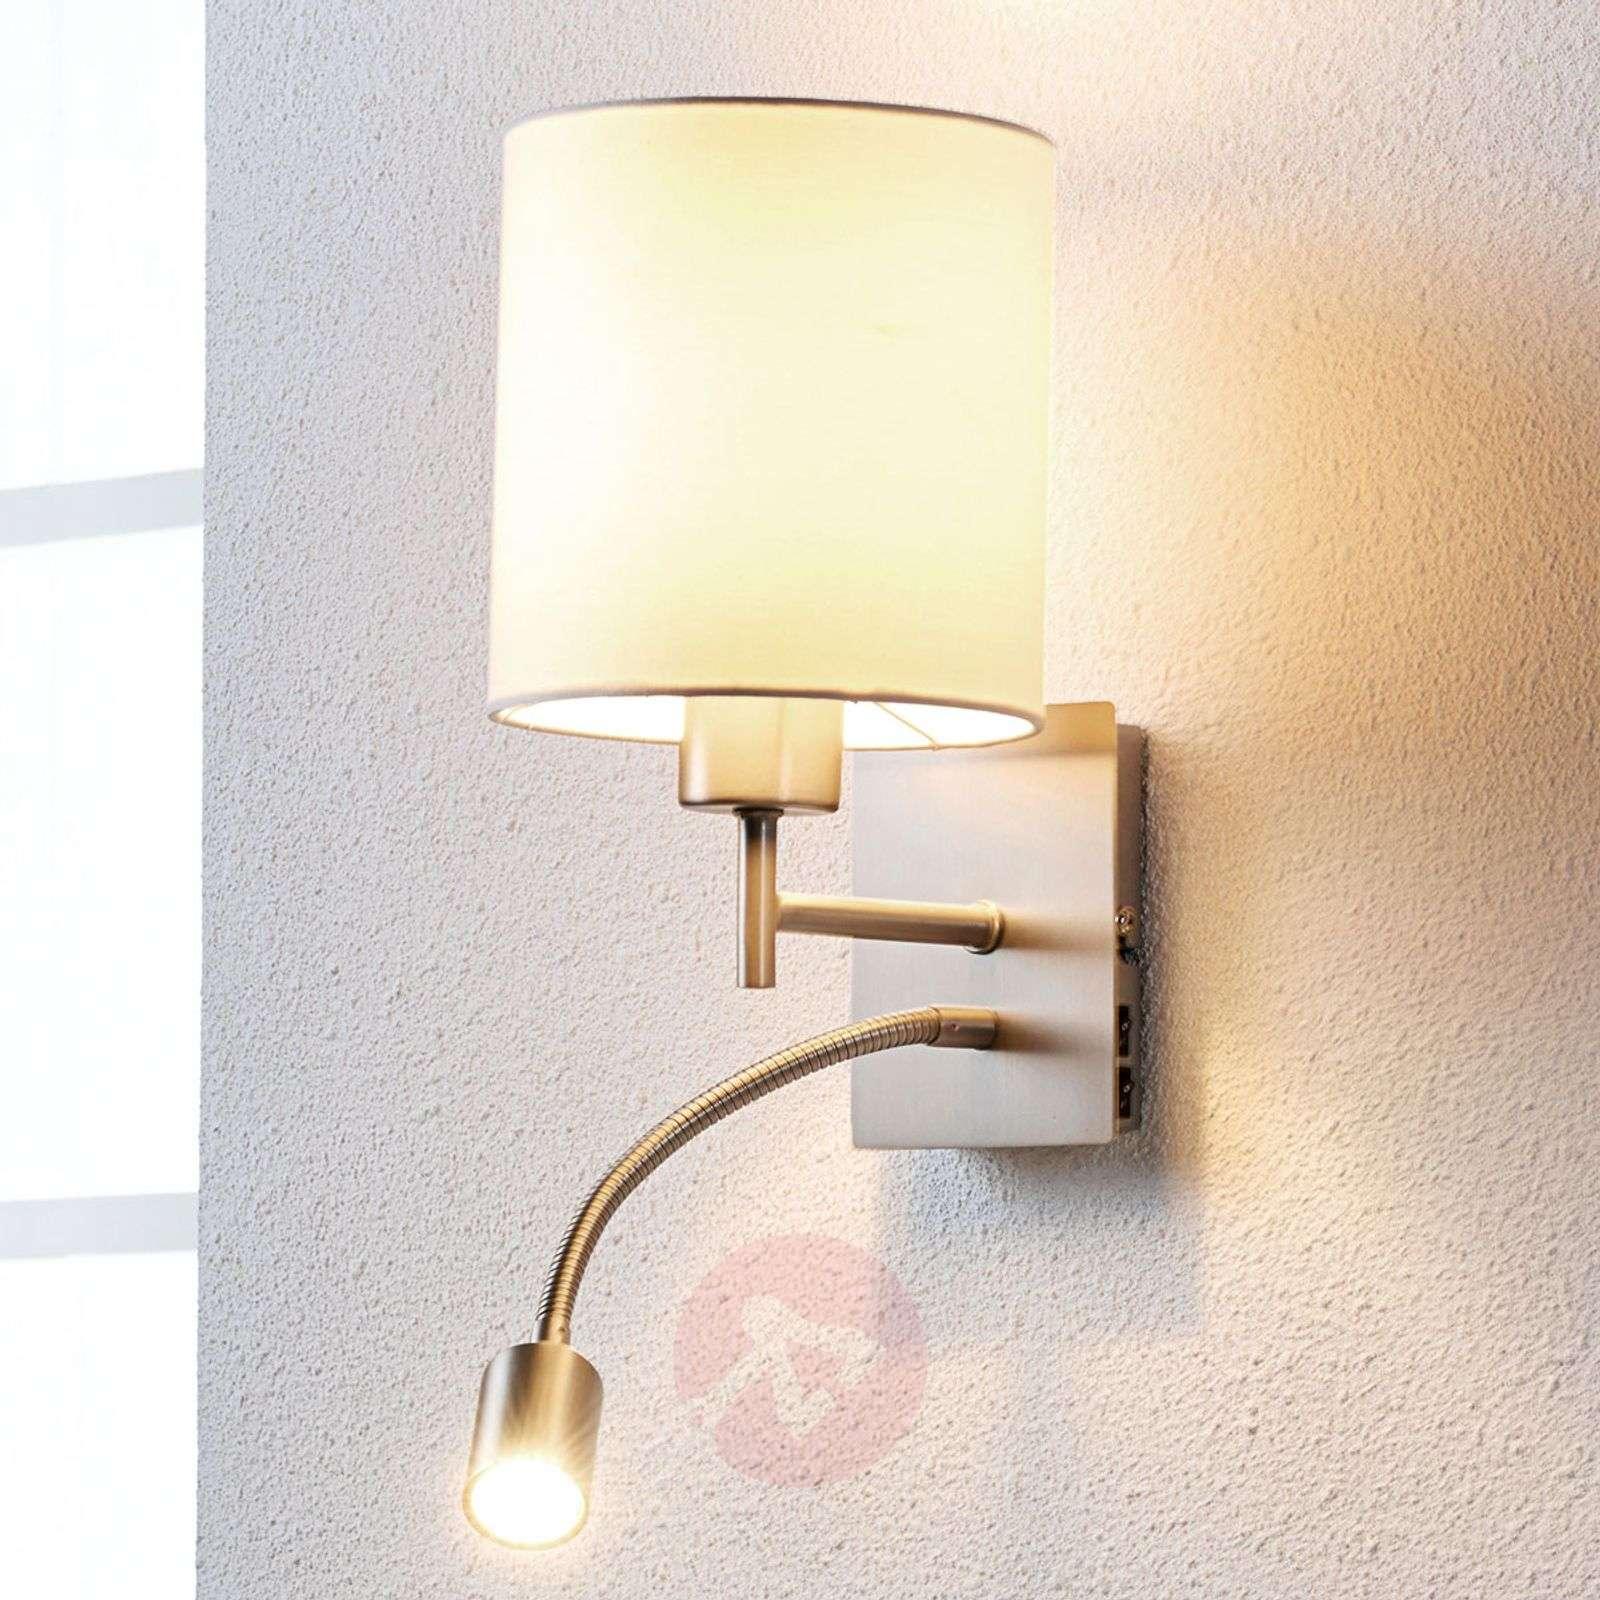 Attractive fabric wall lamp Camilo w reading light-9620924-03